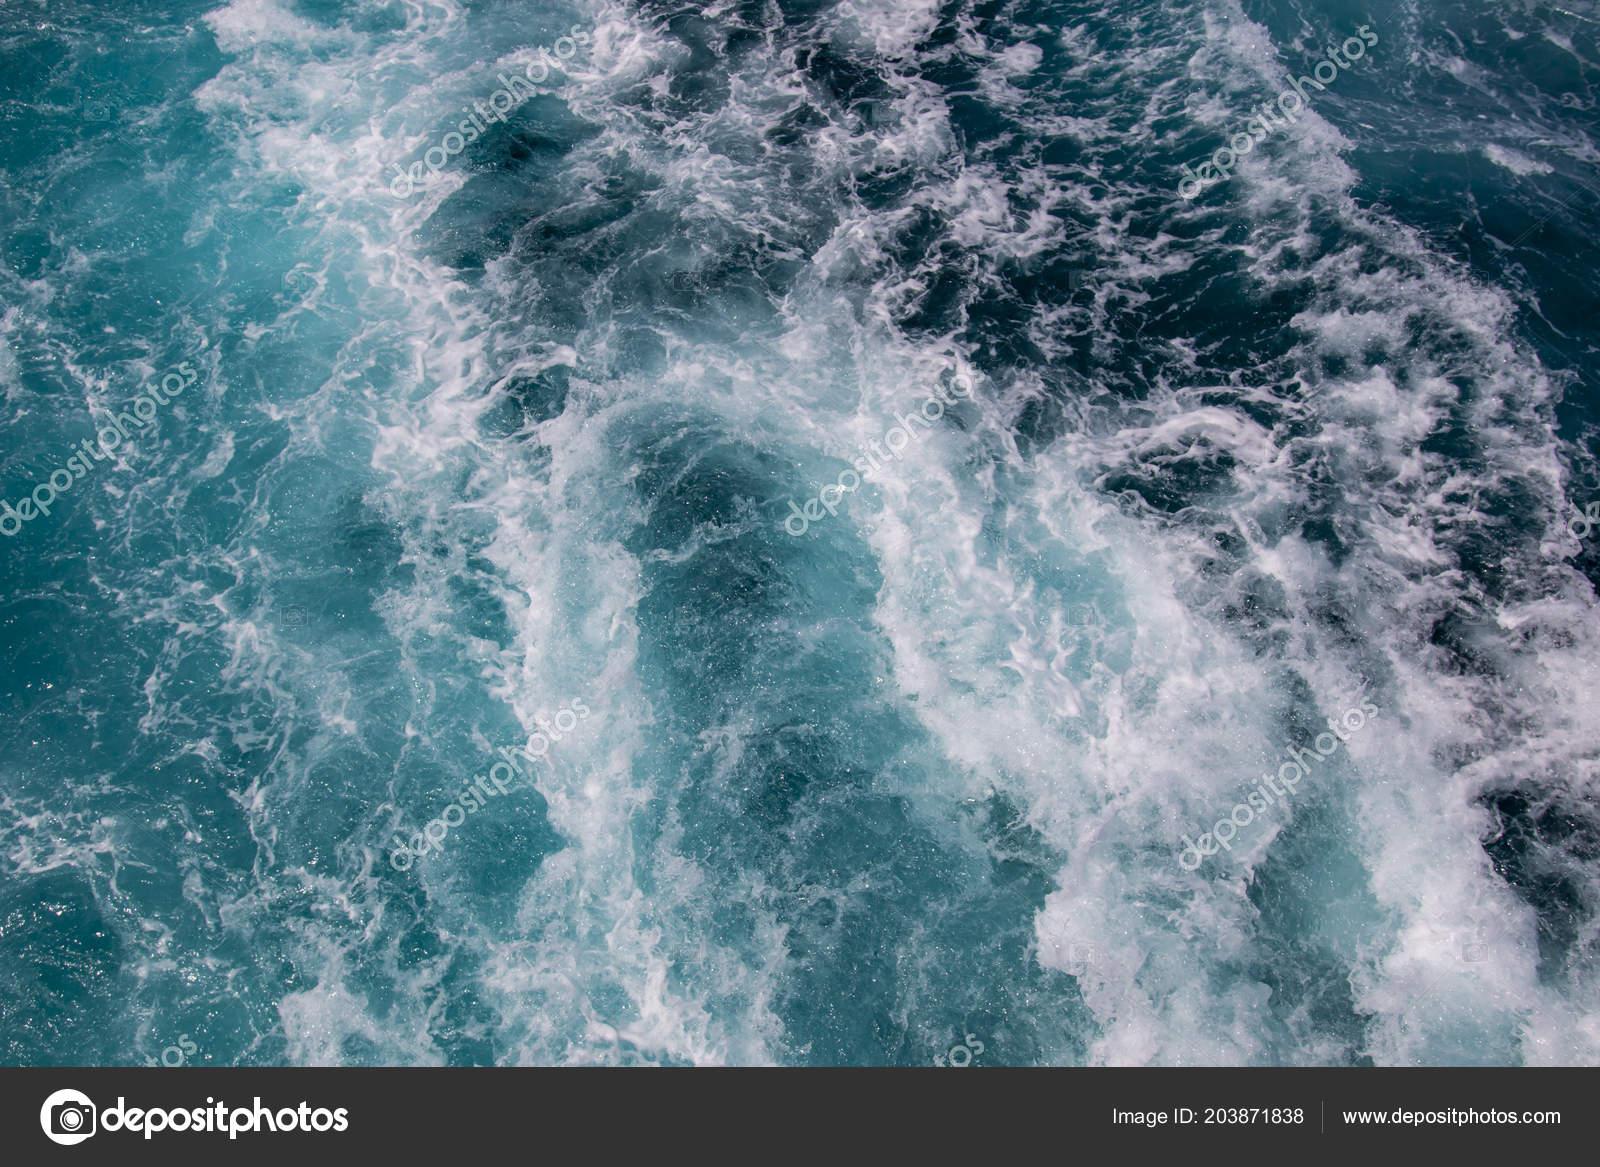 Ocean Surface Sea Foam Blue Ocean Background More Options Portfolio Stock Photo Image By C Ranimiro 203871838